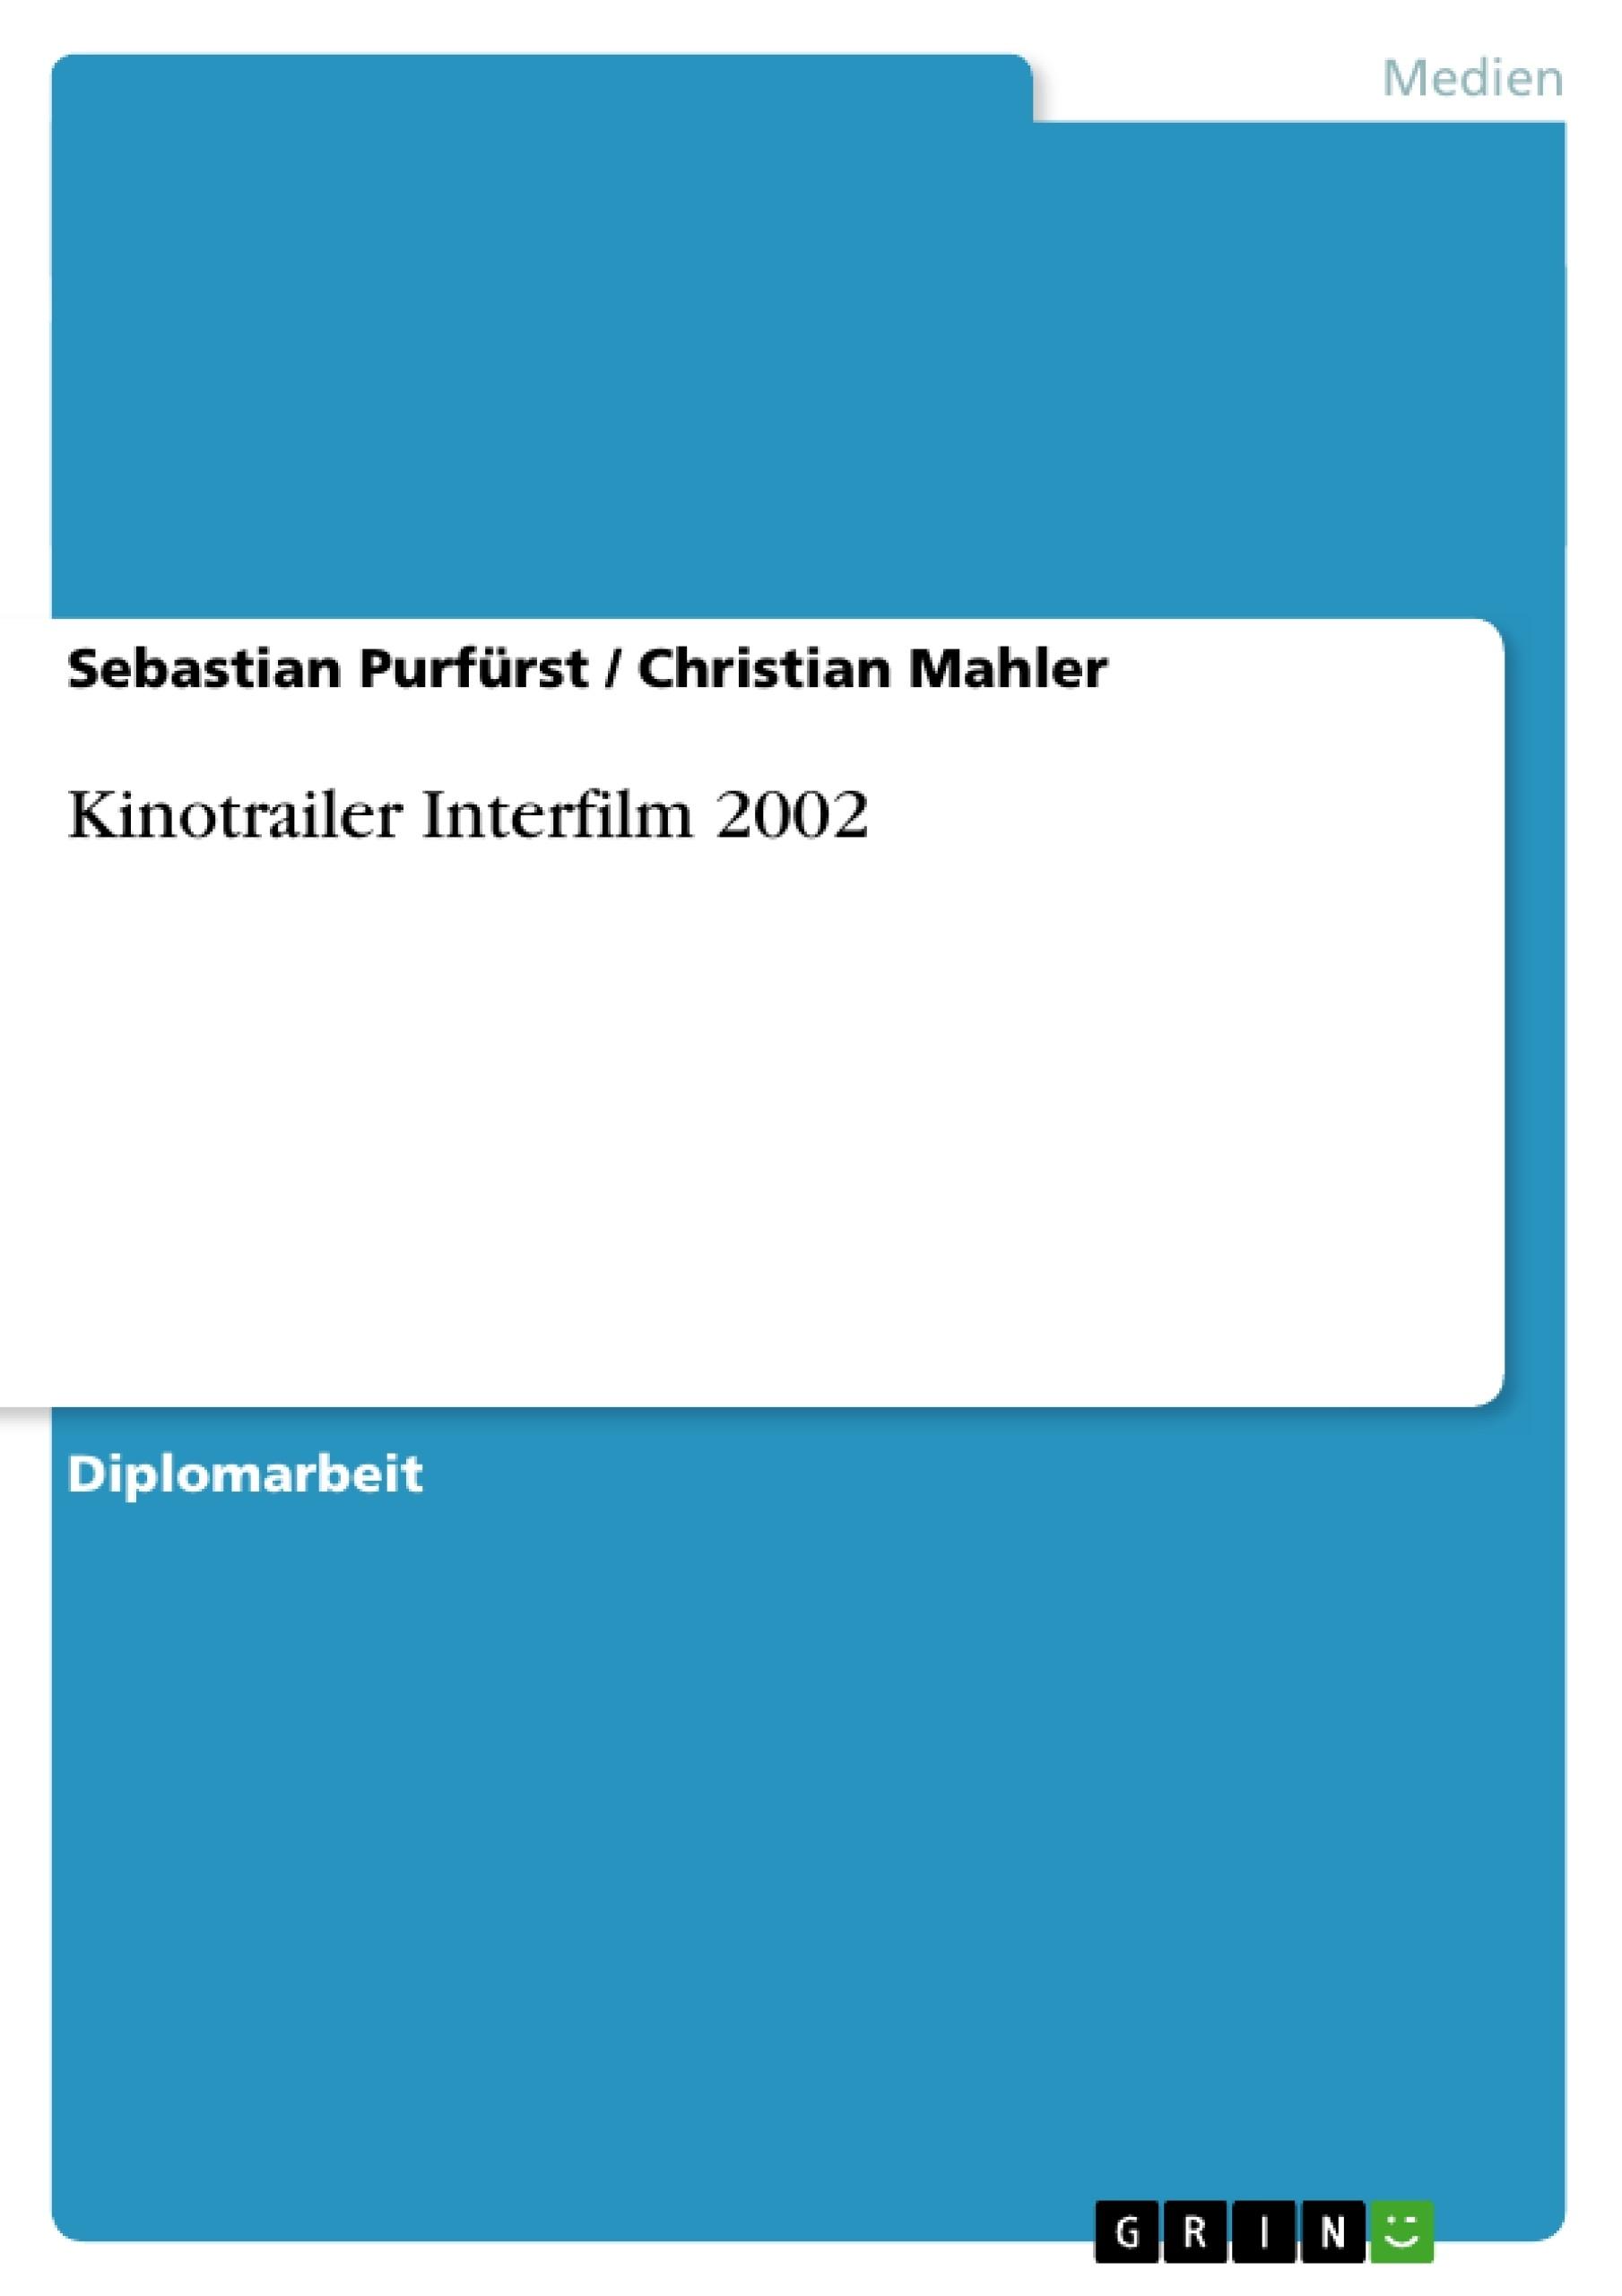 Titel: Kinotrailer Interfilm 2002